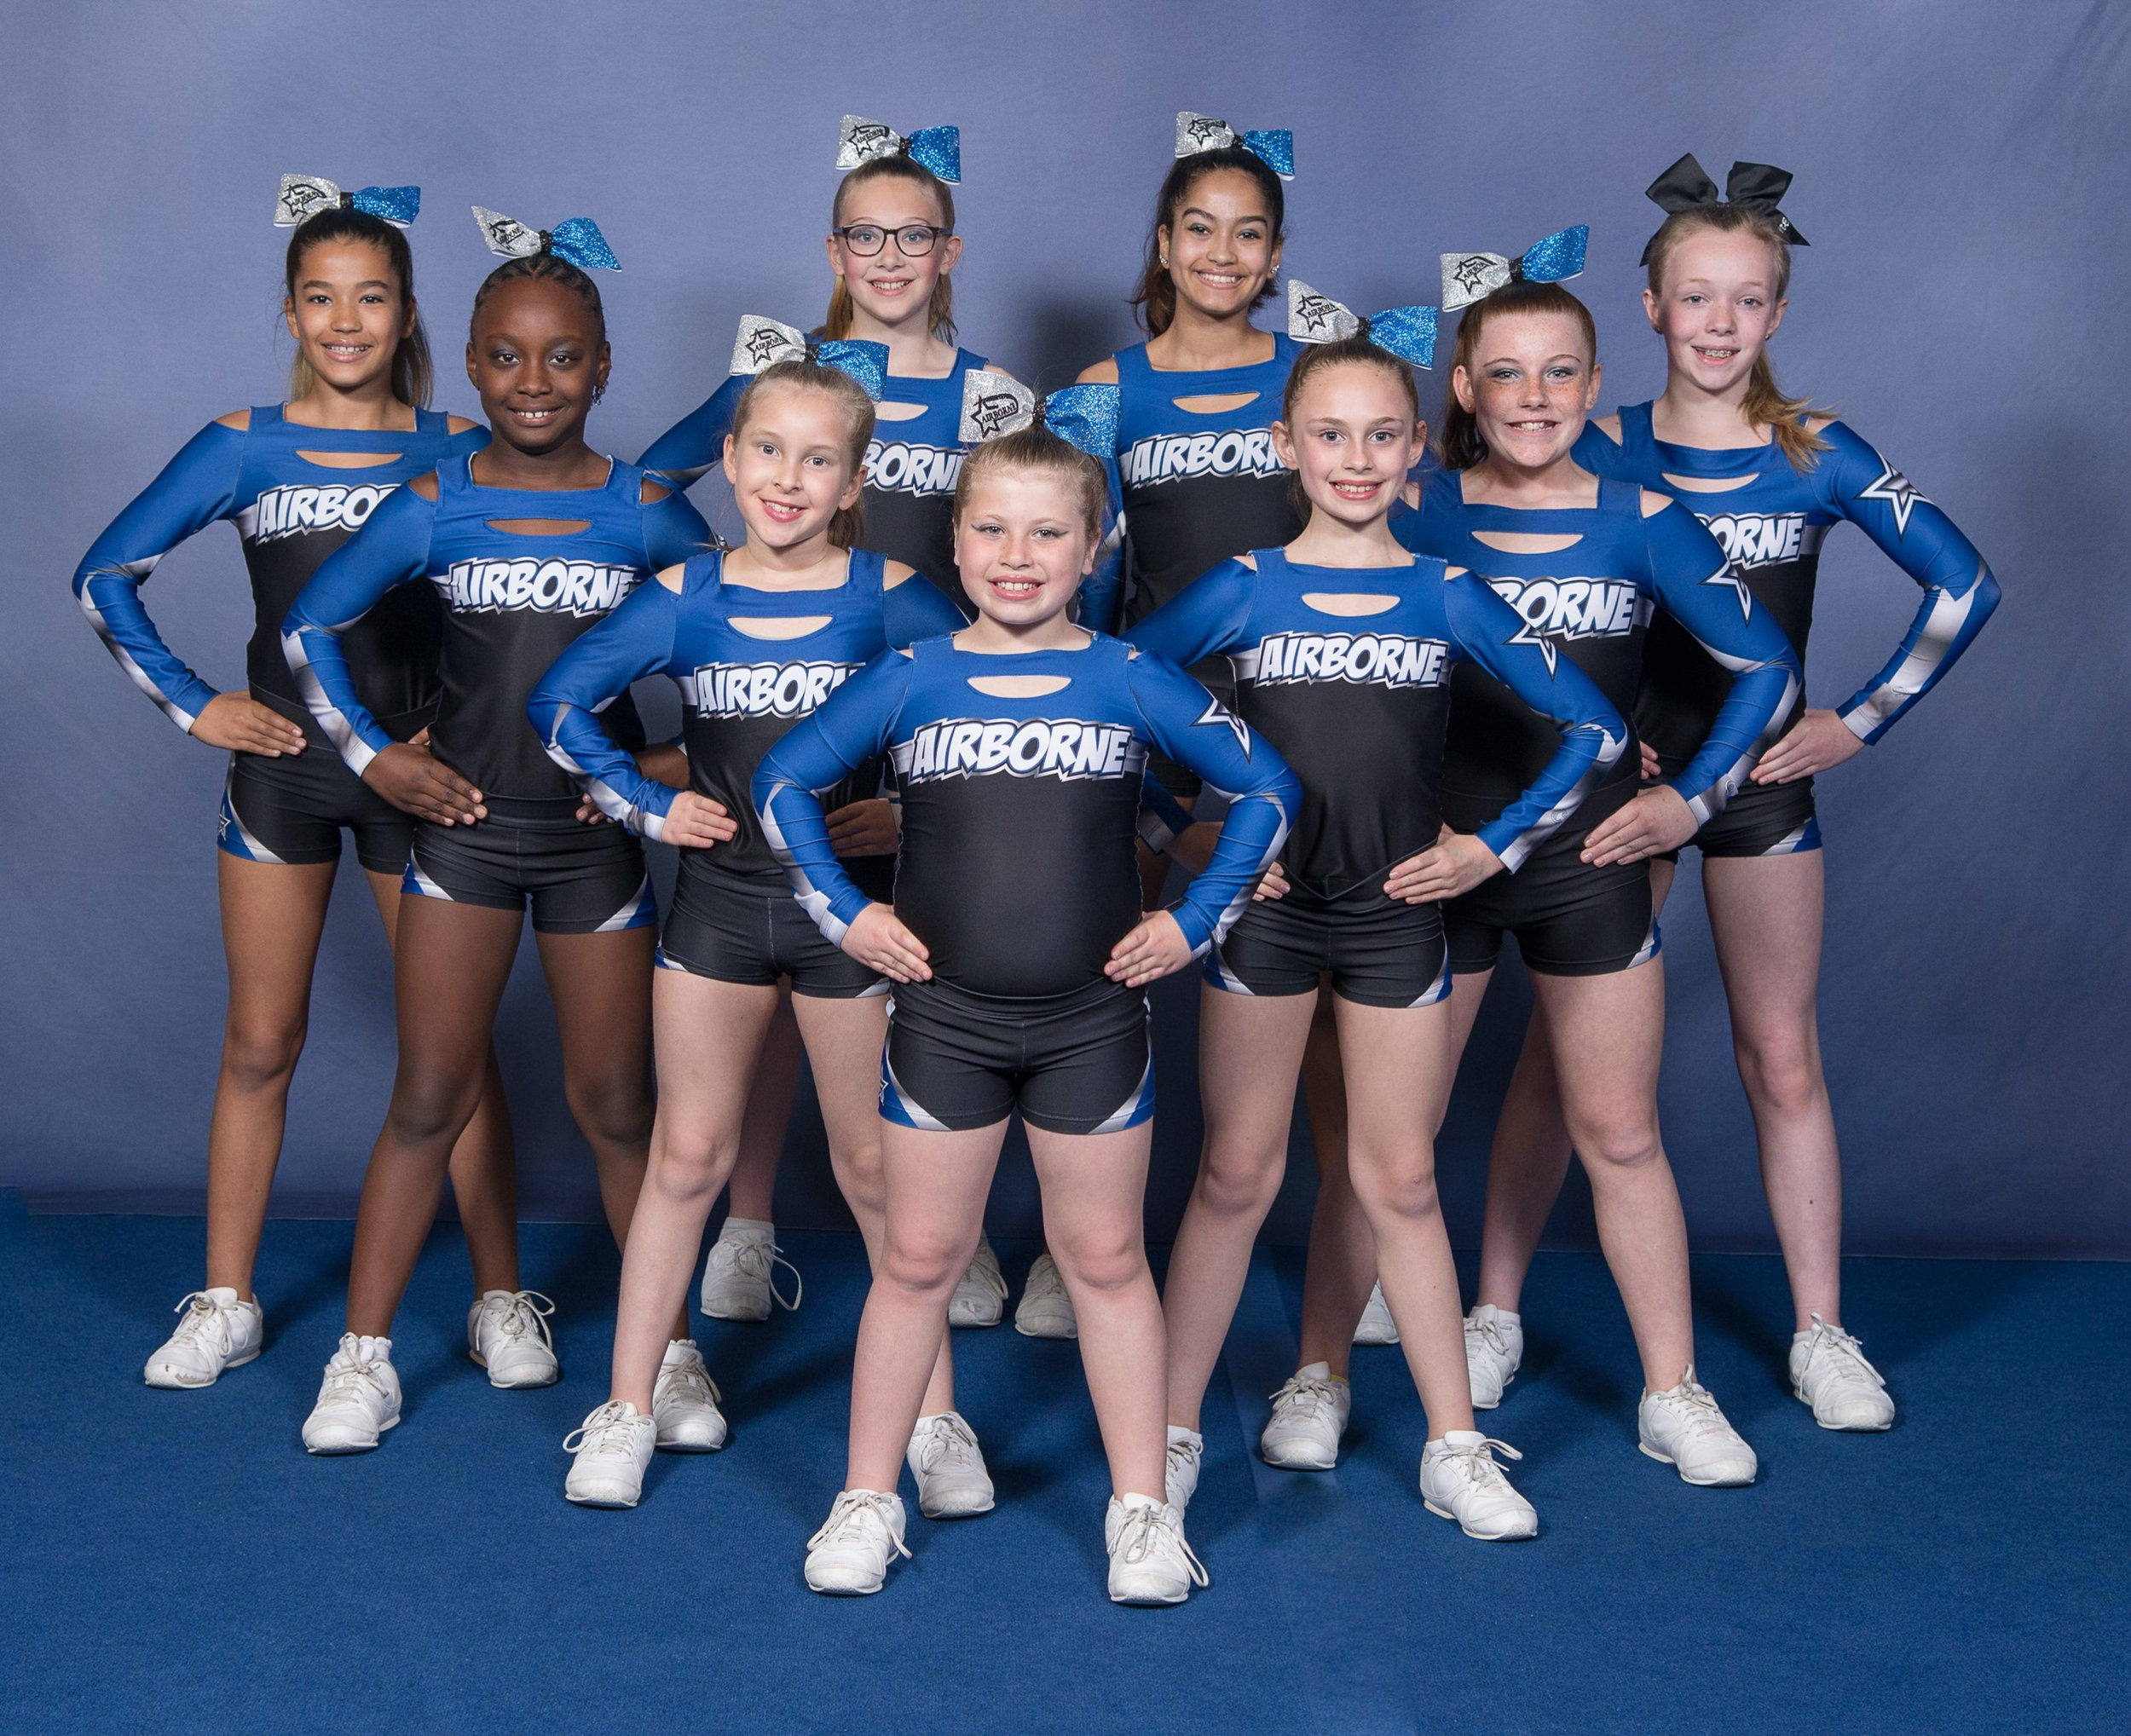 cheer team picture2019.jpg